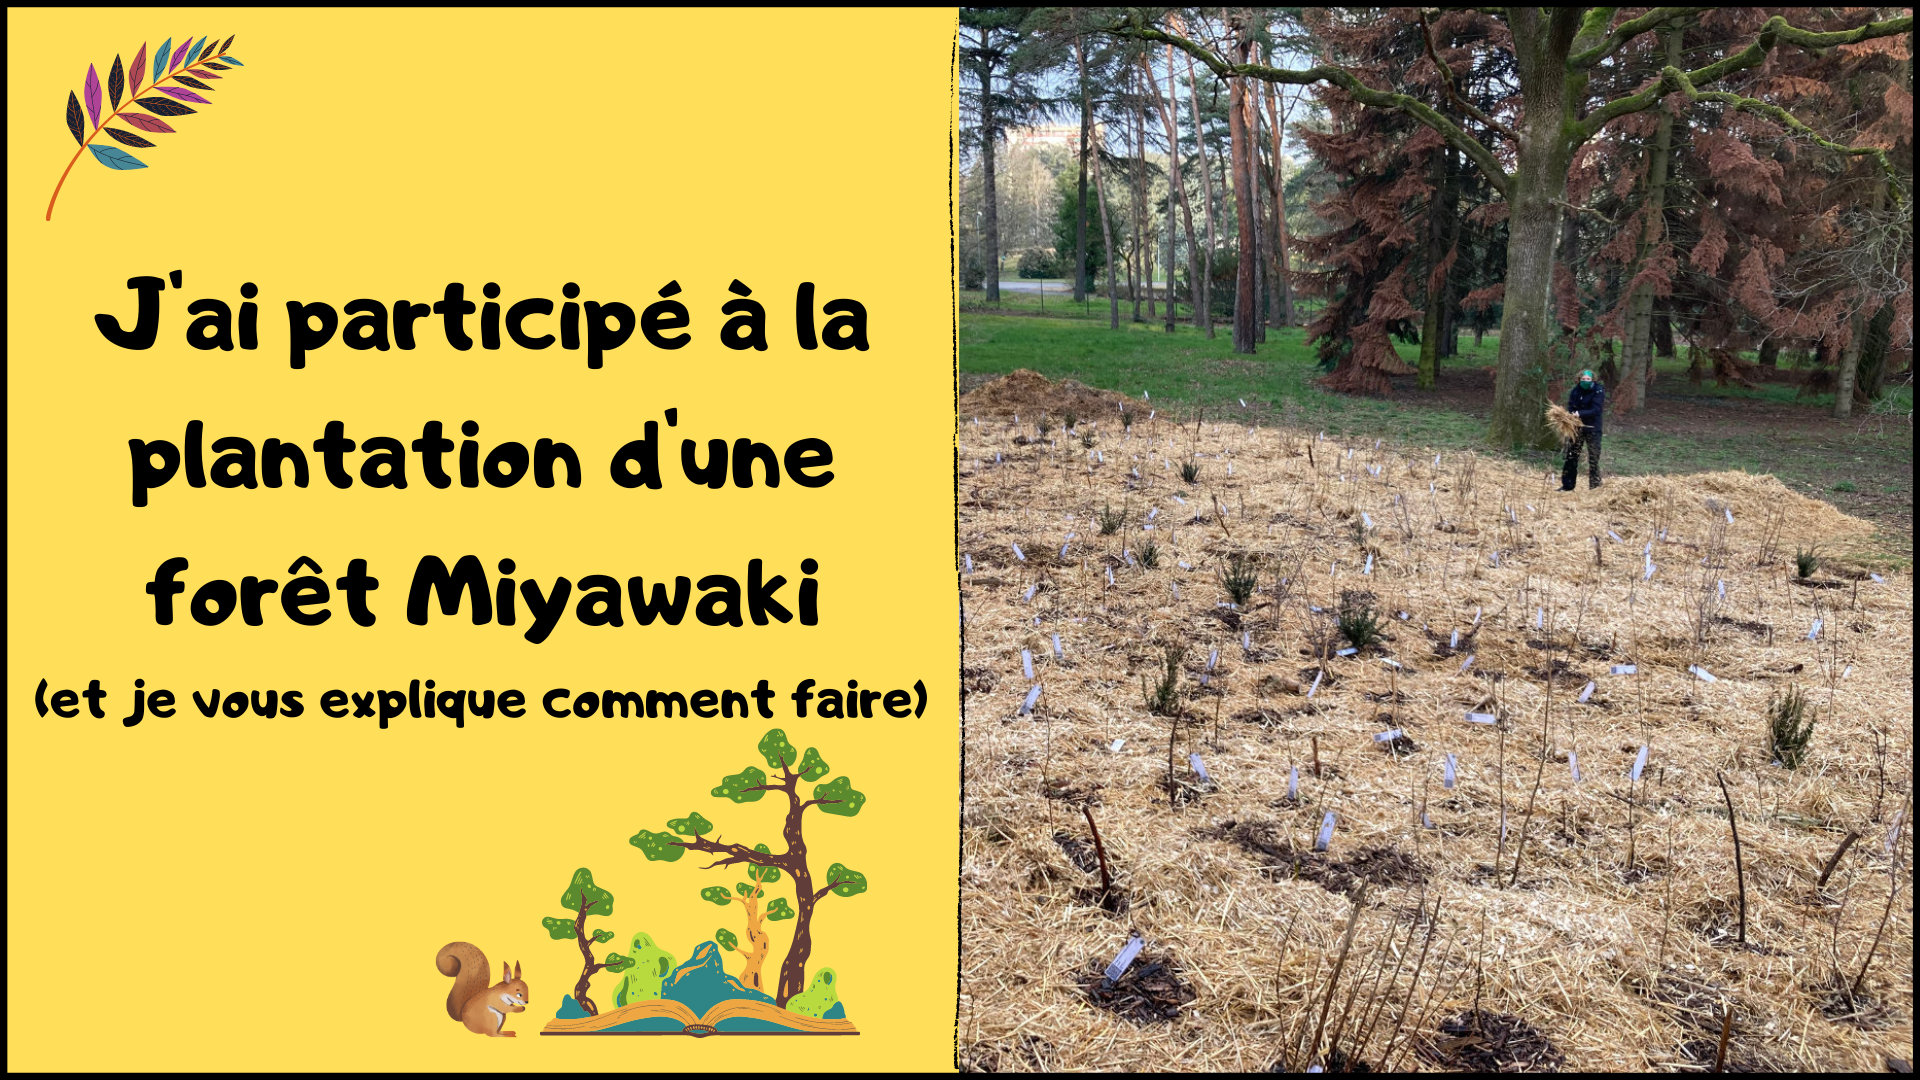 plantation-foret-miyawaki-lyon-parilly